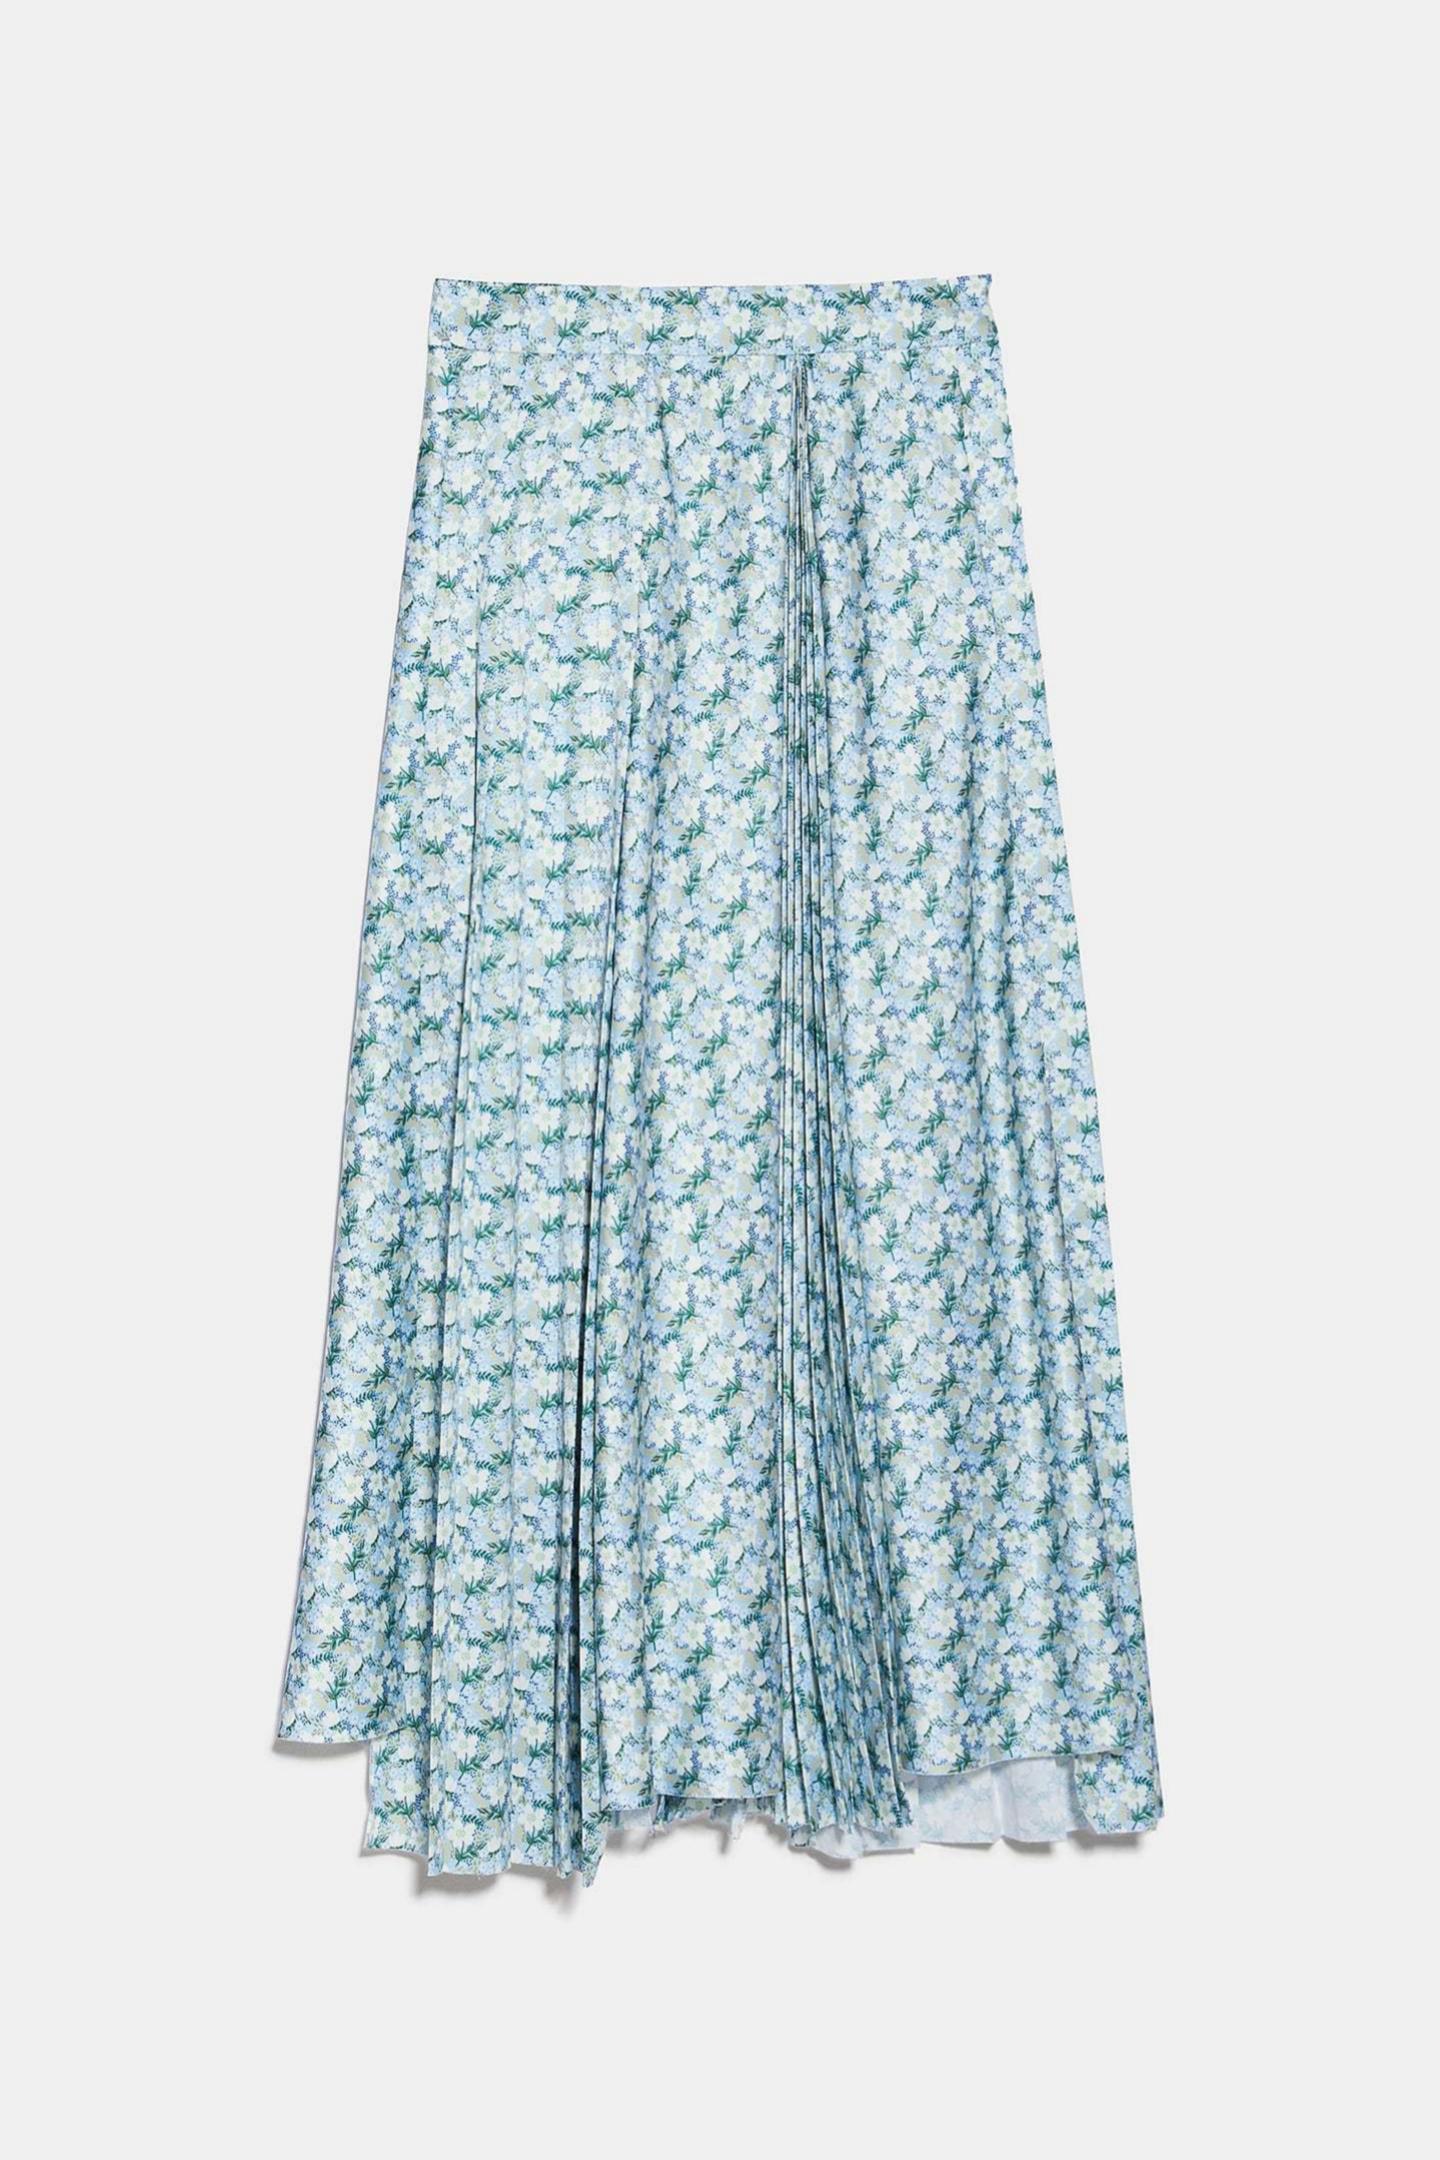 Falda plisada asimétrica estampada de Zara (49,95¤)